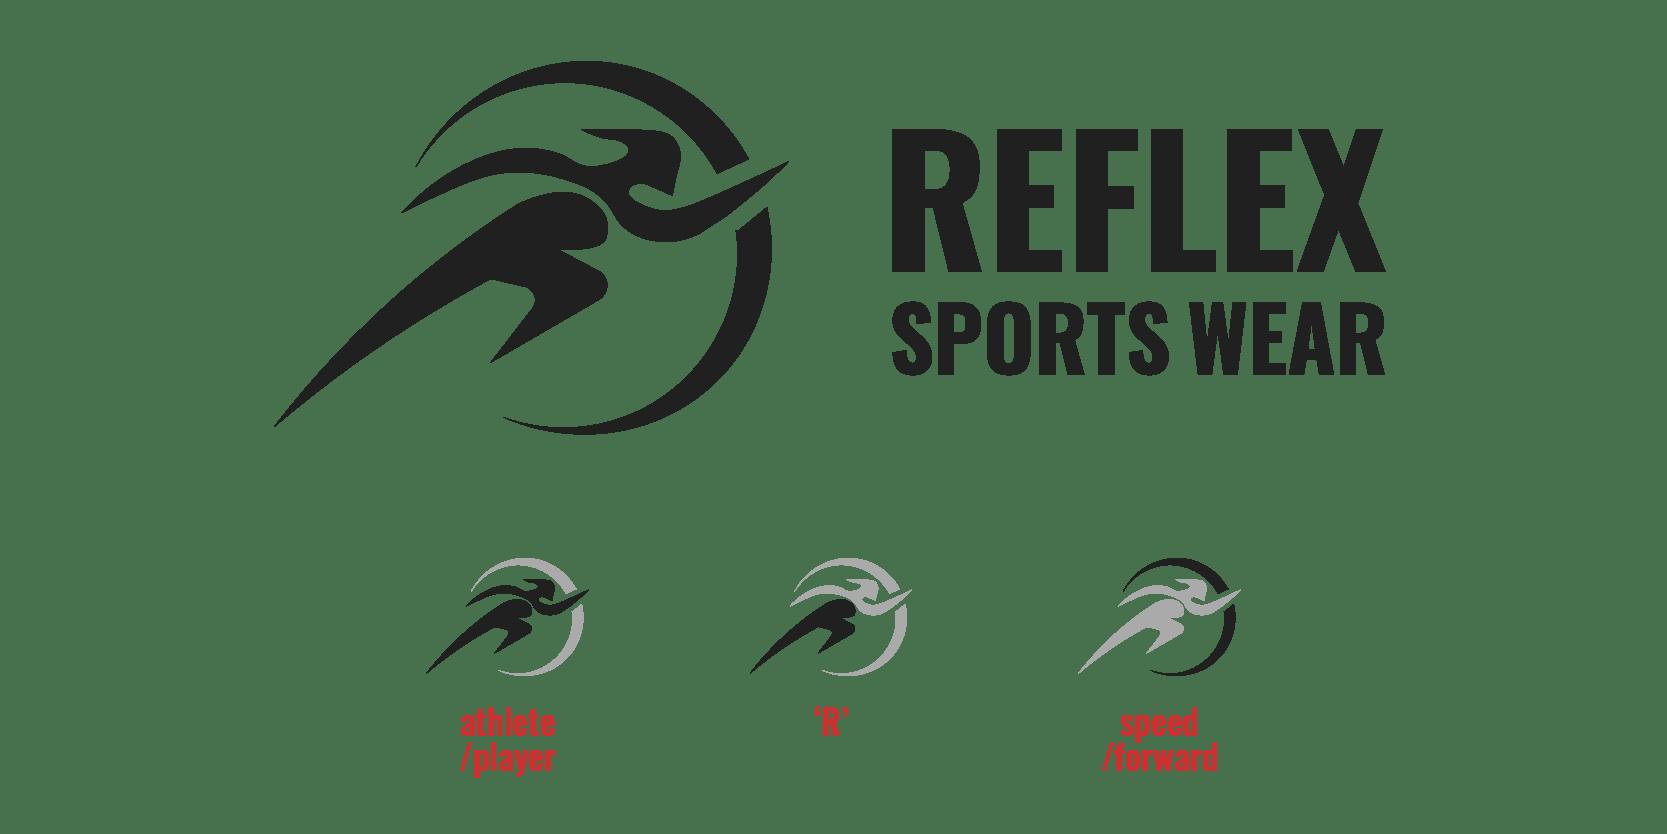 Reflex logo design by XAXs